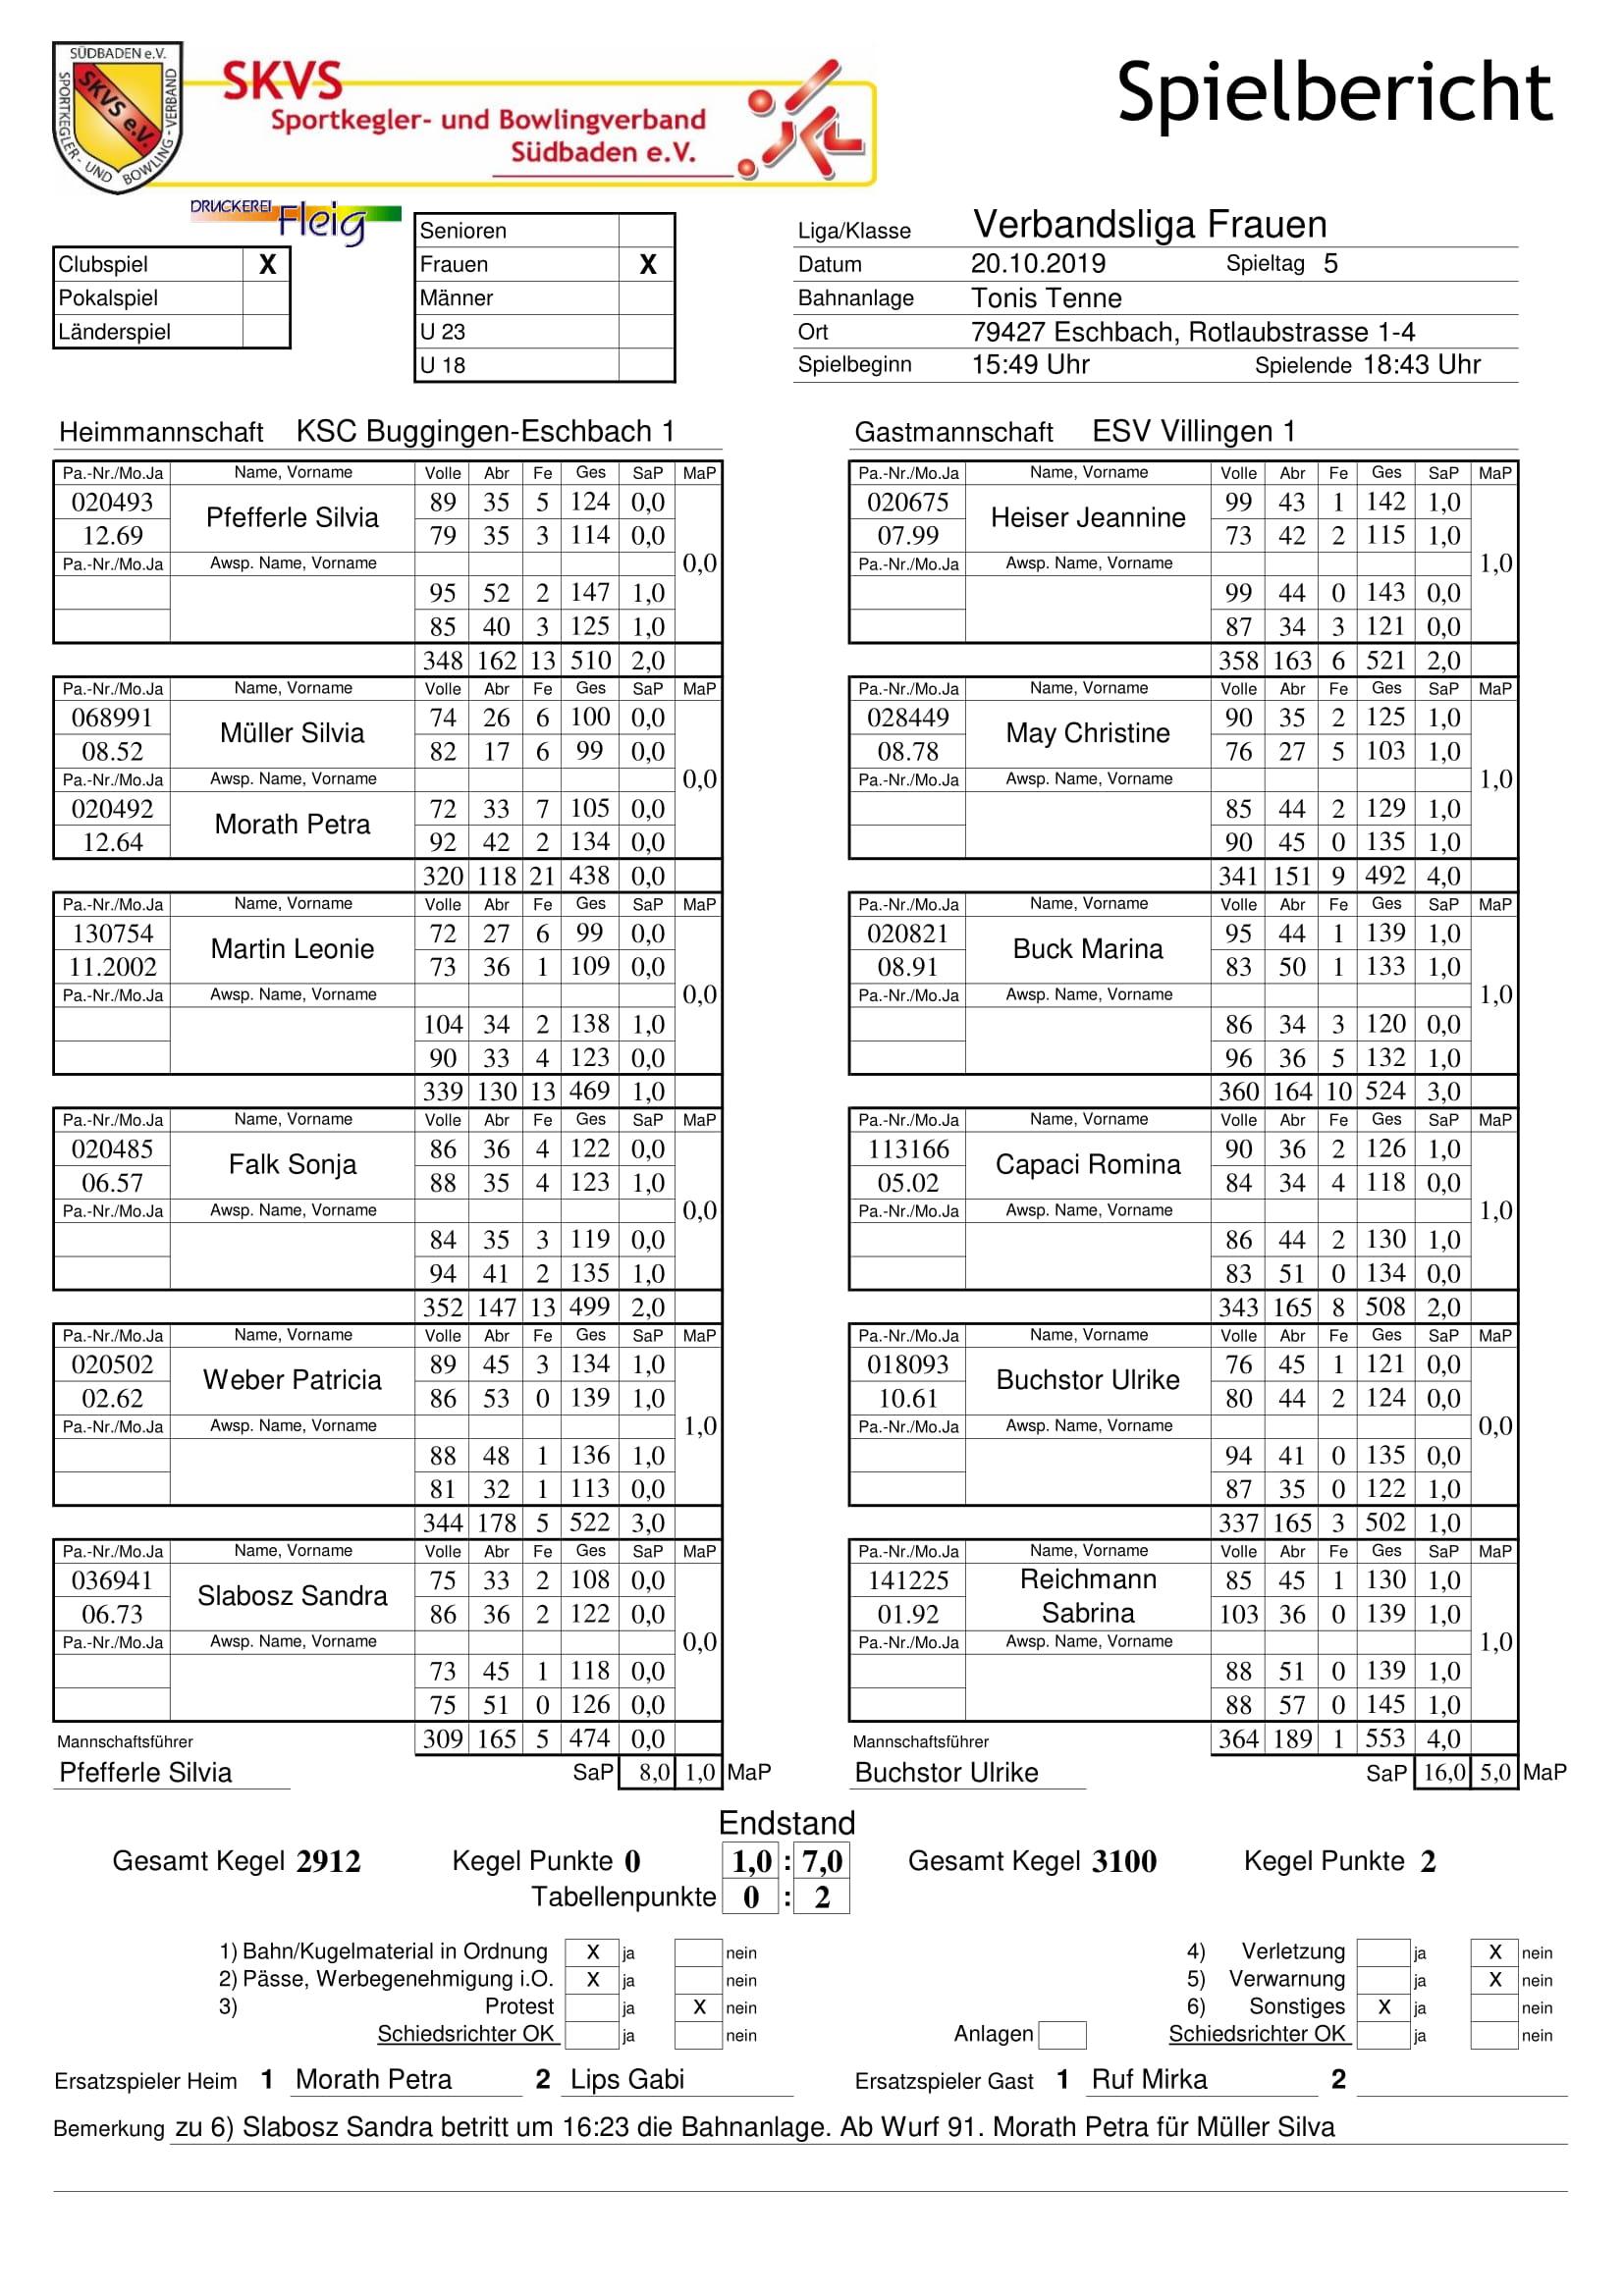 ESV Villingen Damen 1 Gegen KSC Buggingen-Eschbach 1